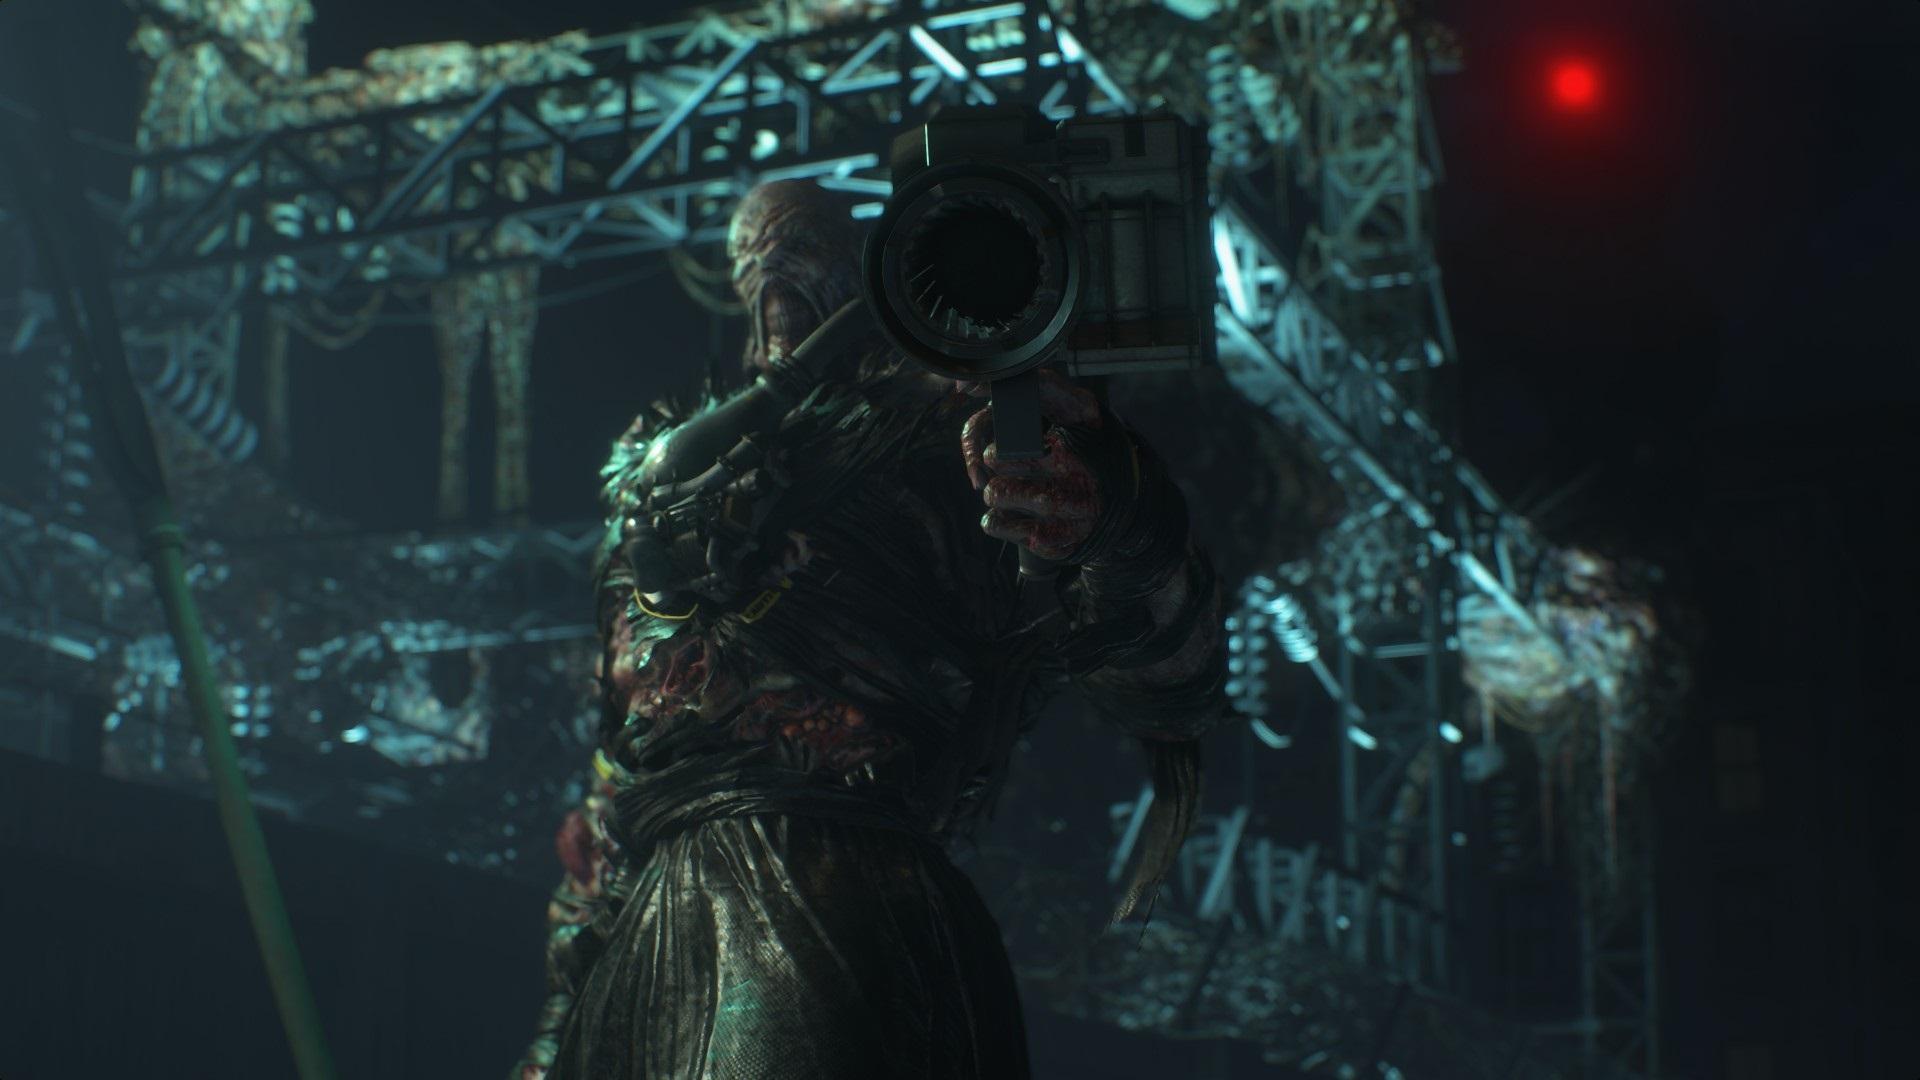 imagen del análisis de Resident Evil 3 Remake videojuego